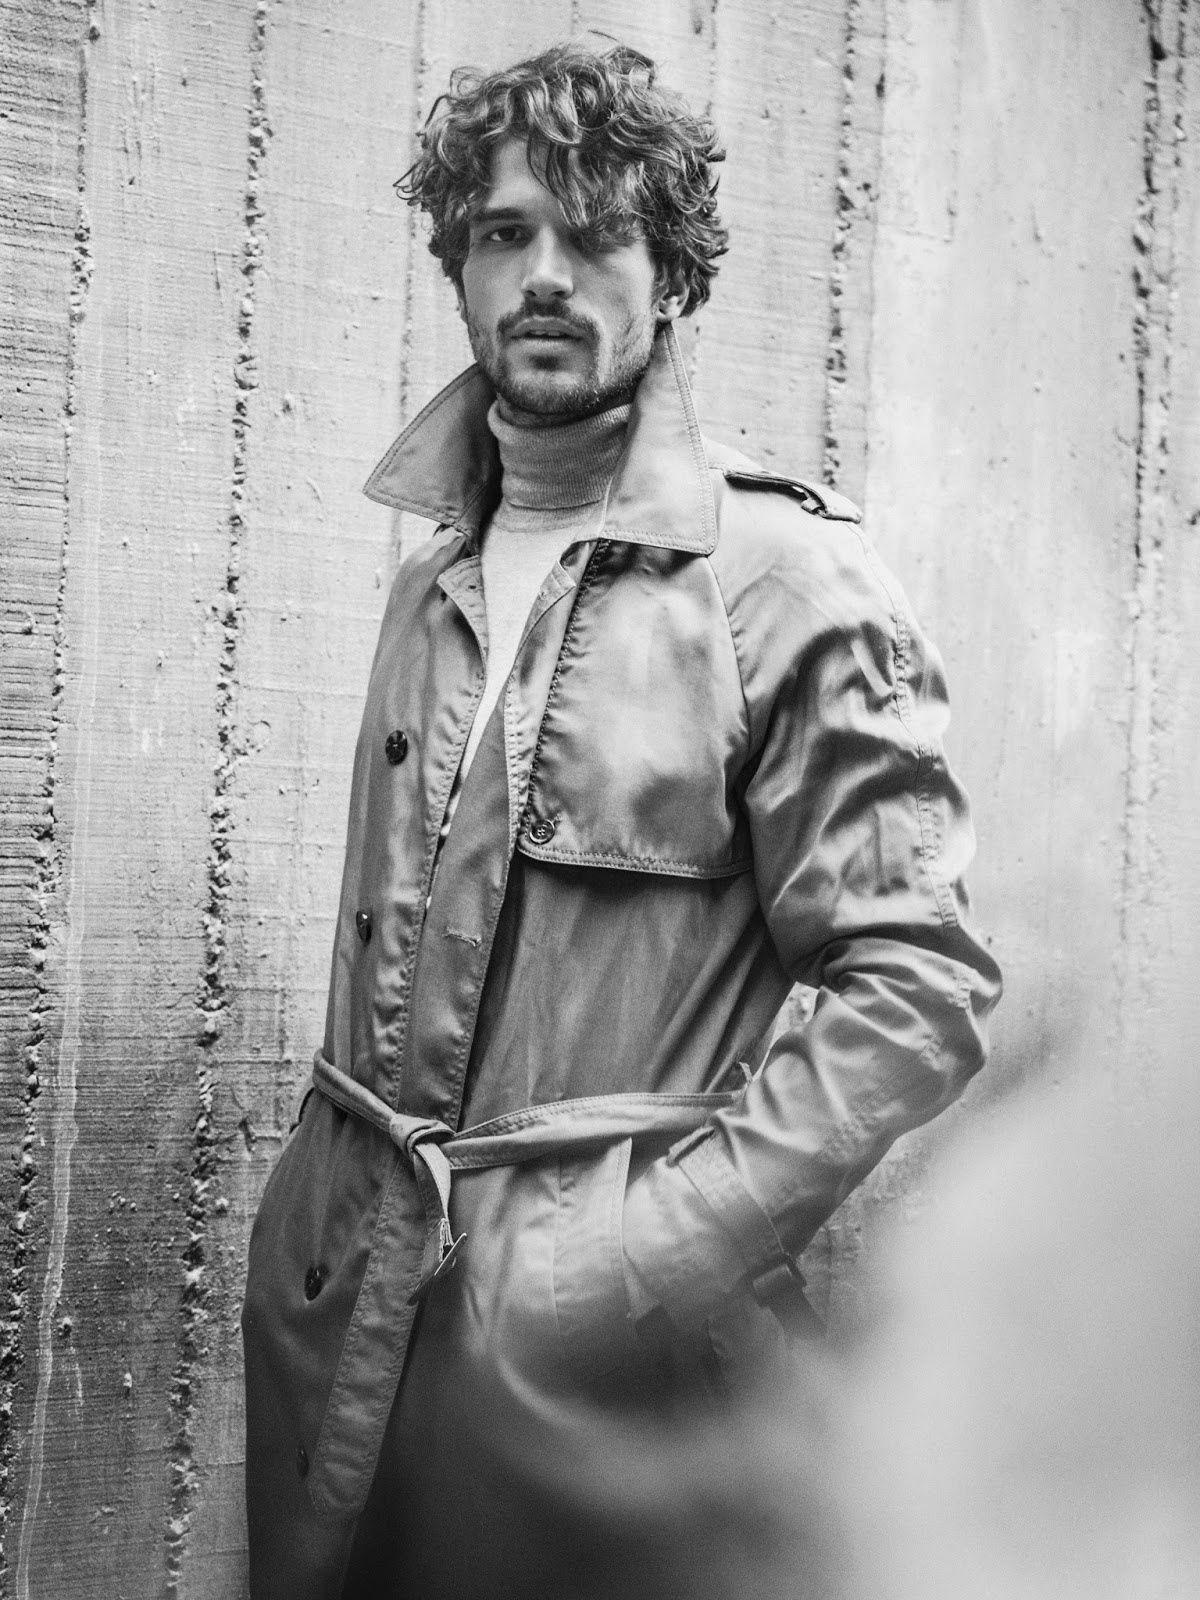 Paul Kelly par Alejandro Brito - 1